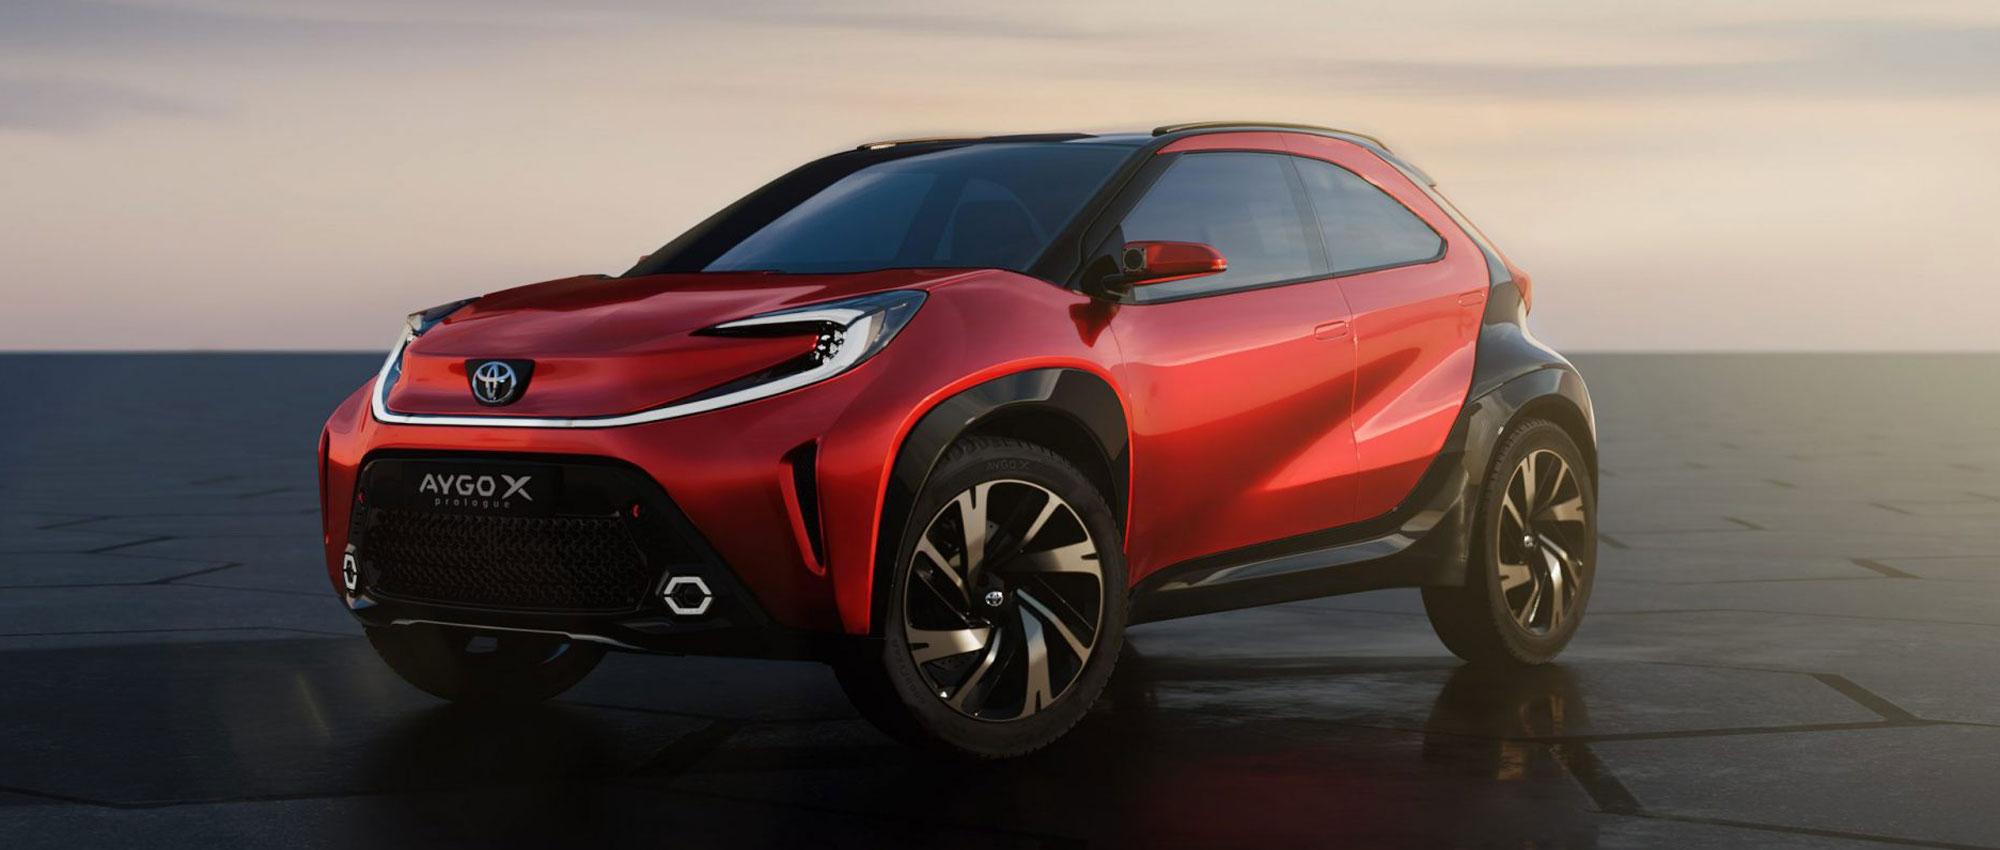 Toyota-aygo-cross-2021